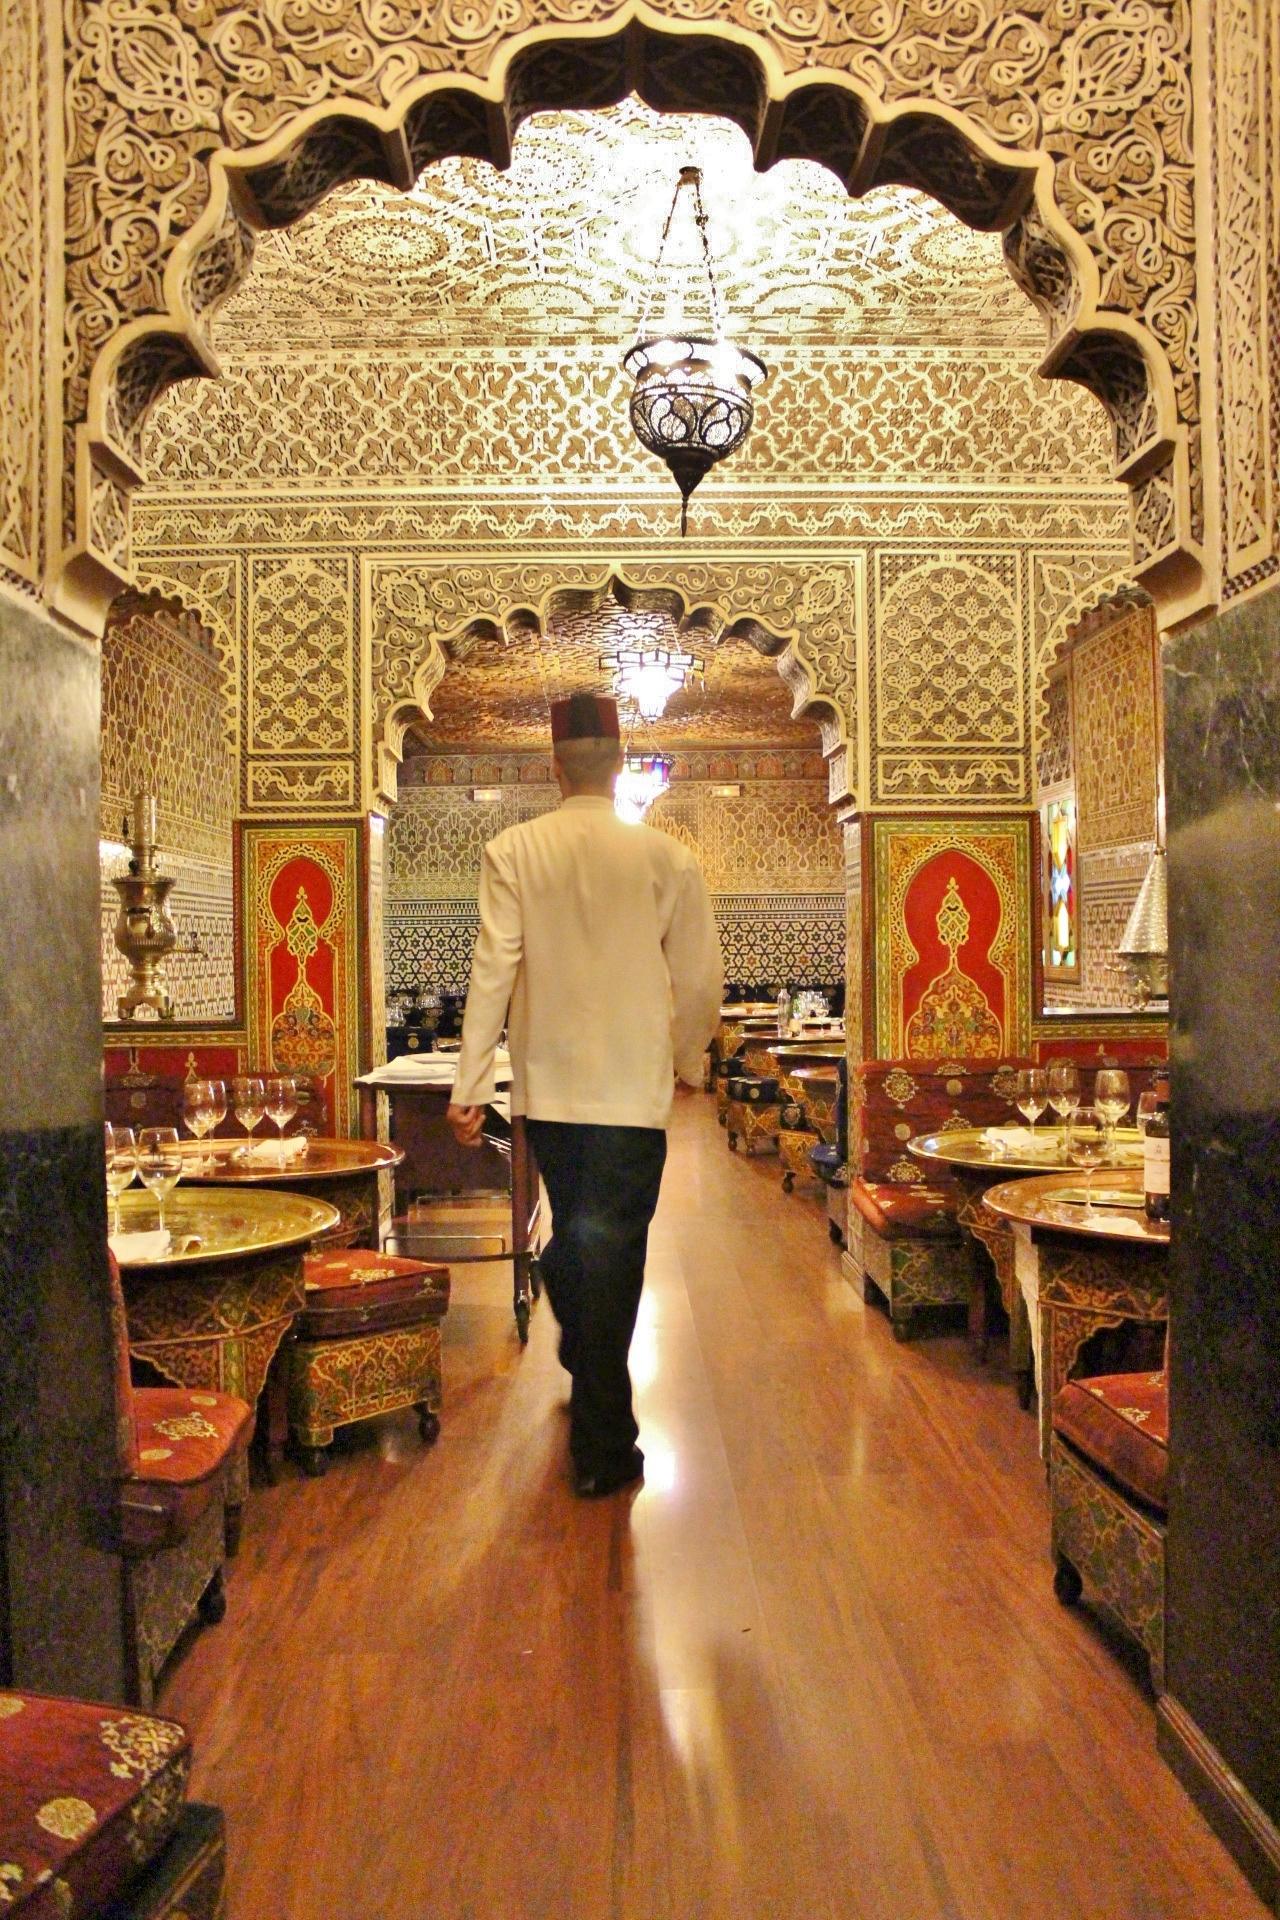 Restaurante marroqu al mounia madridmayrit - Decoracion marruecos ...